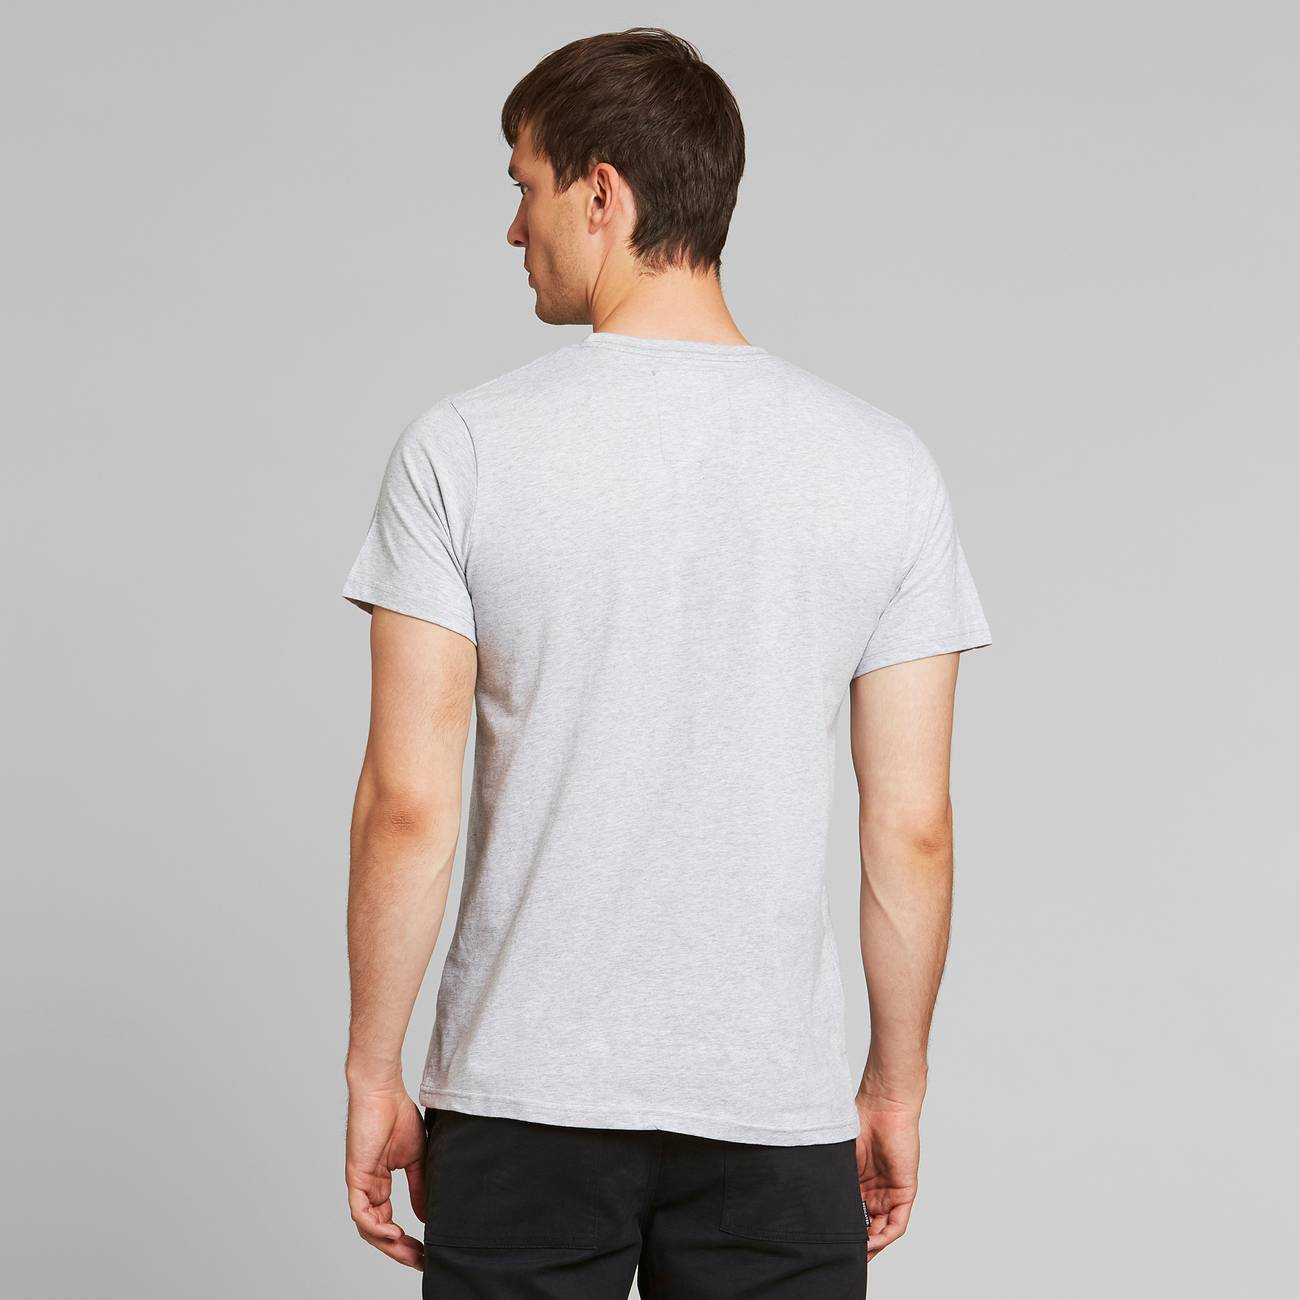 T-shirt Stockholm Peas and Love Grey Melange